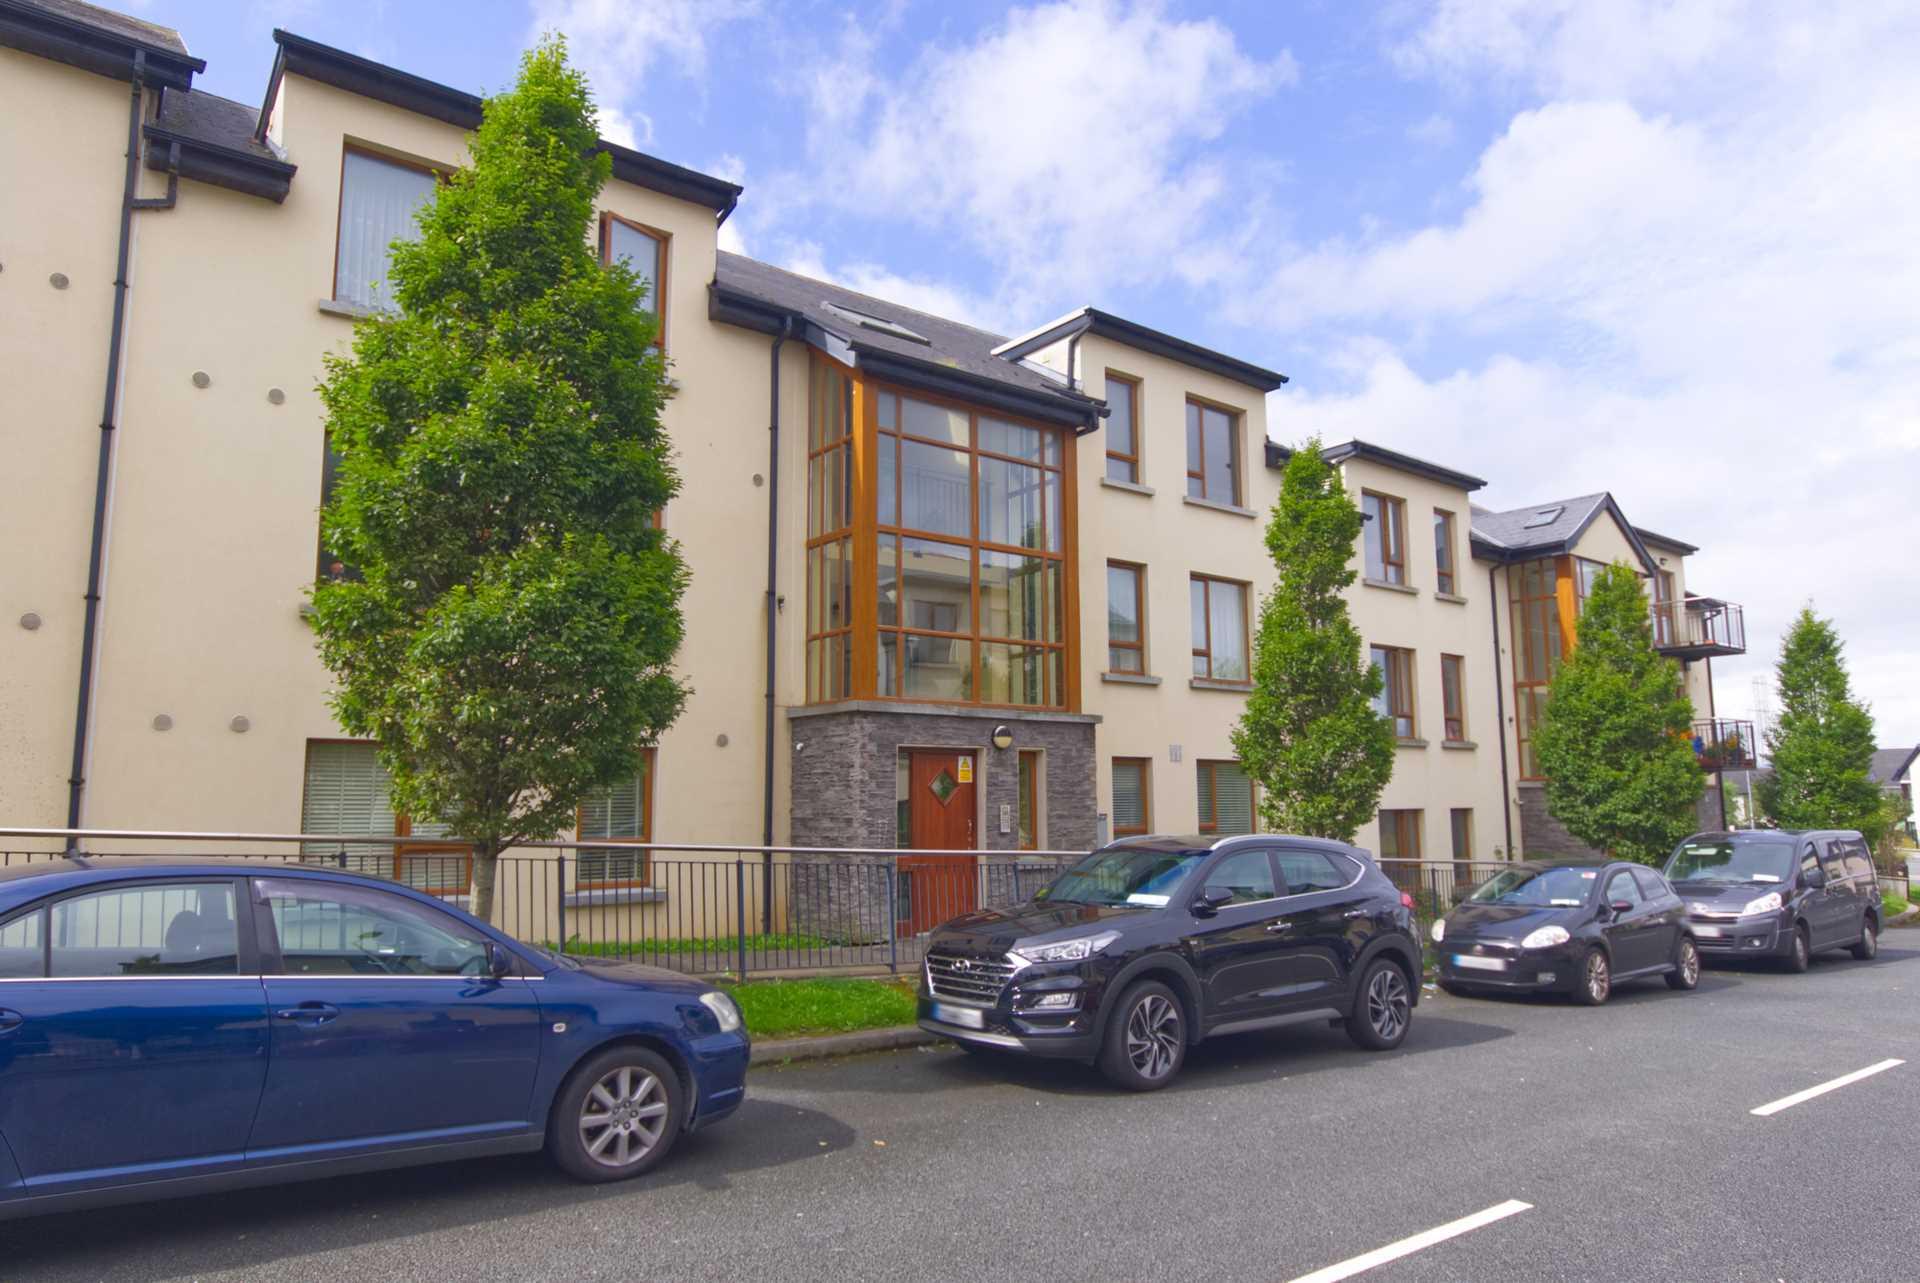 59 Slade Castle Avenue, Saggart, Co Dublin, Image 9